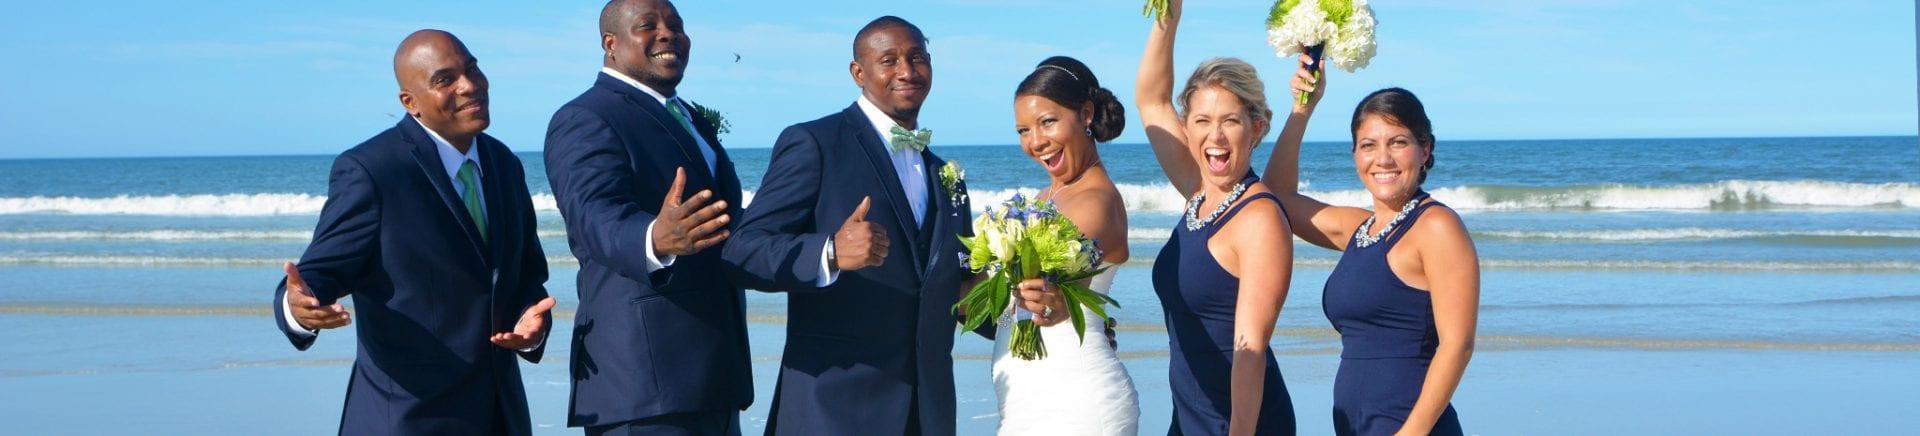 Wedding party celebrating on Daytona Beach